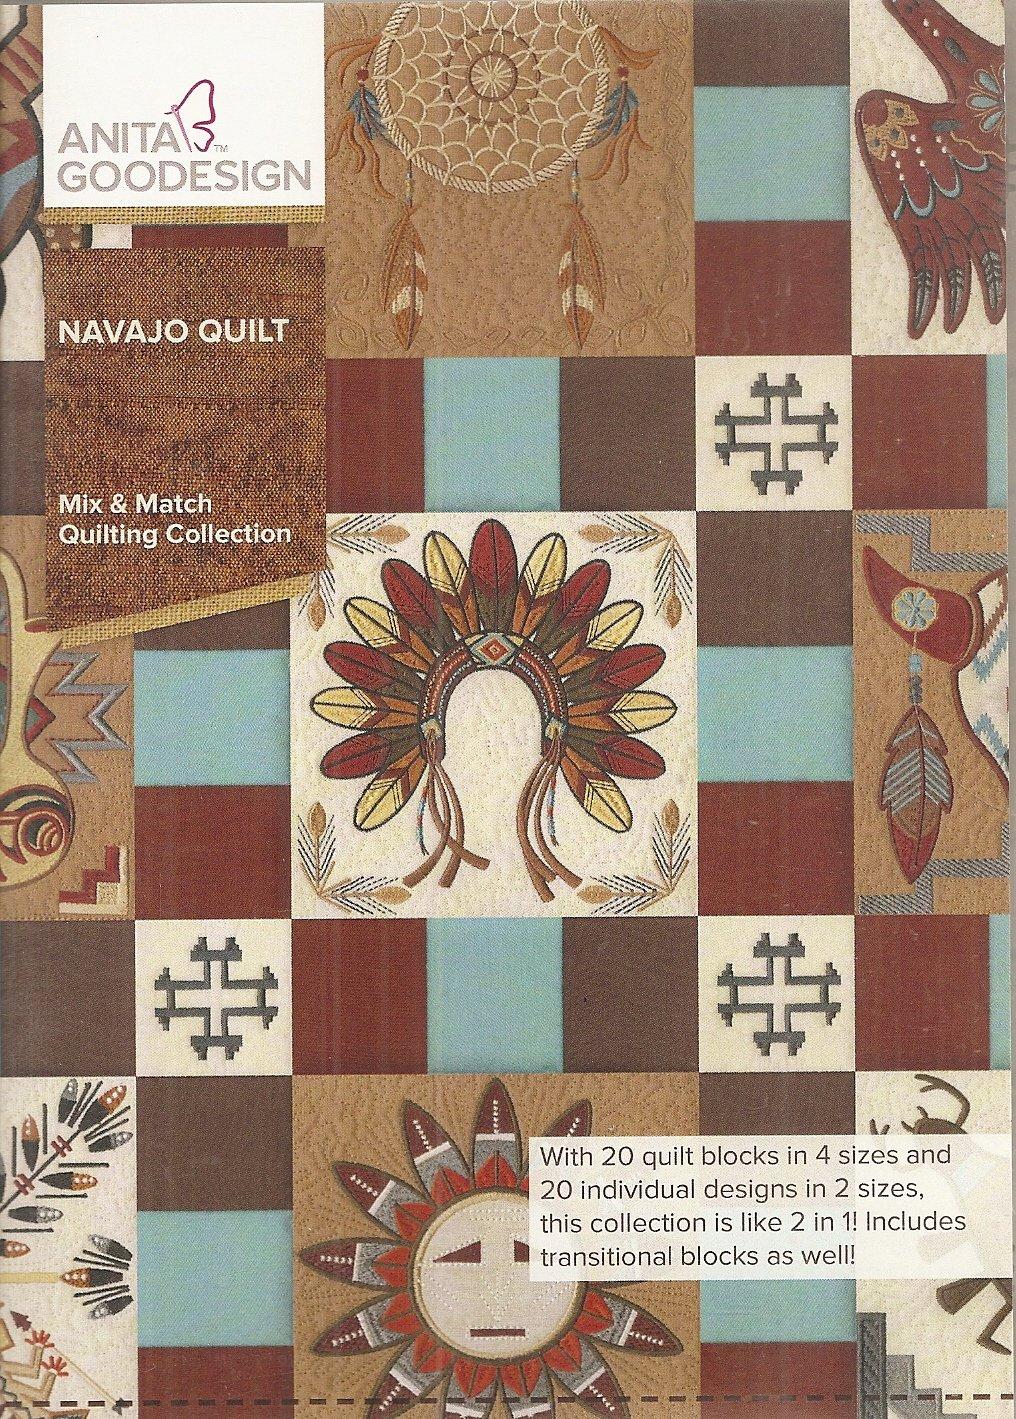 Anita Goodesign Mix Match Quilting Navajo Quilt 079673005285